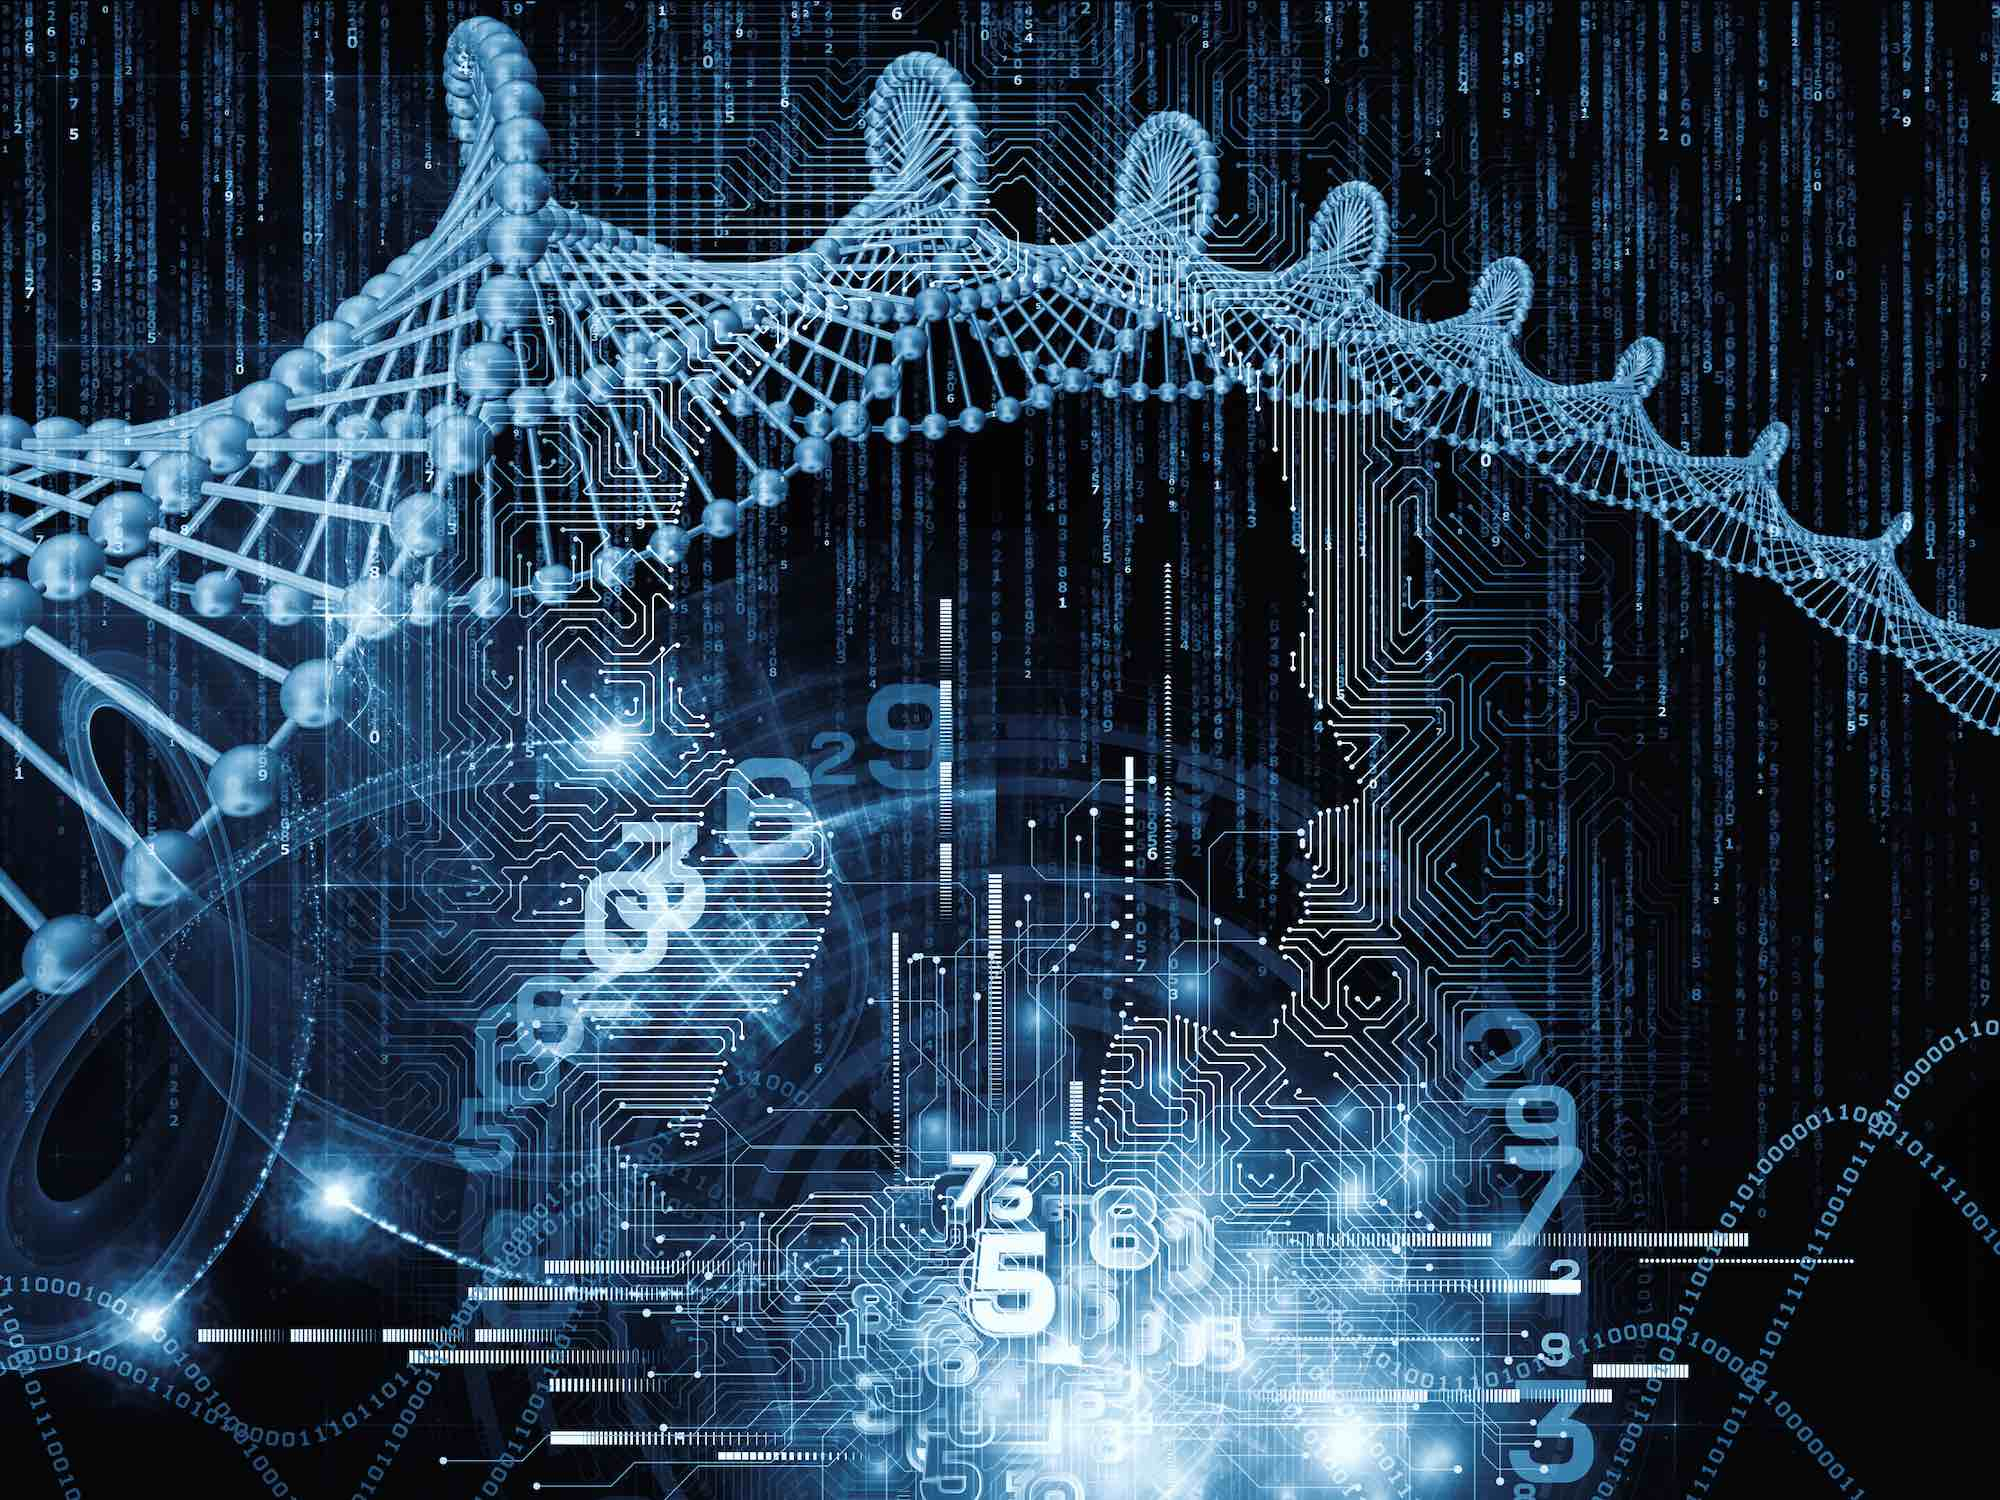 Big Data and Precision Medicine – Can We Quantify Human Health?